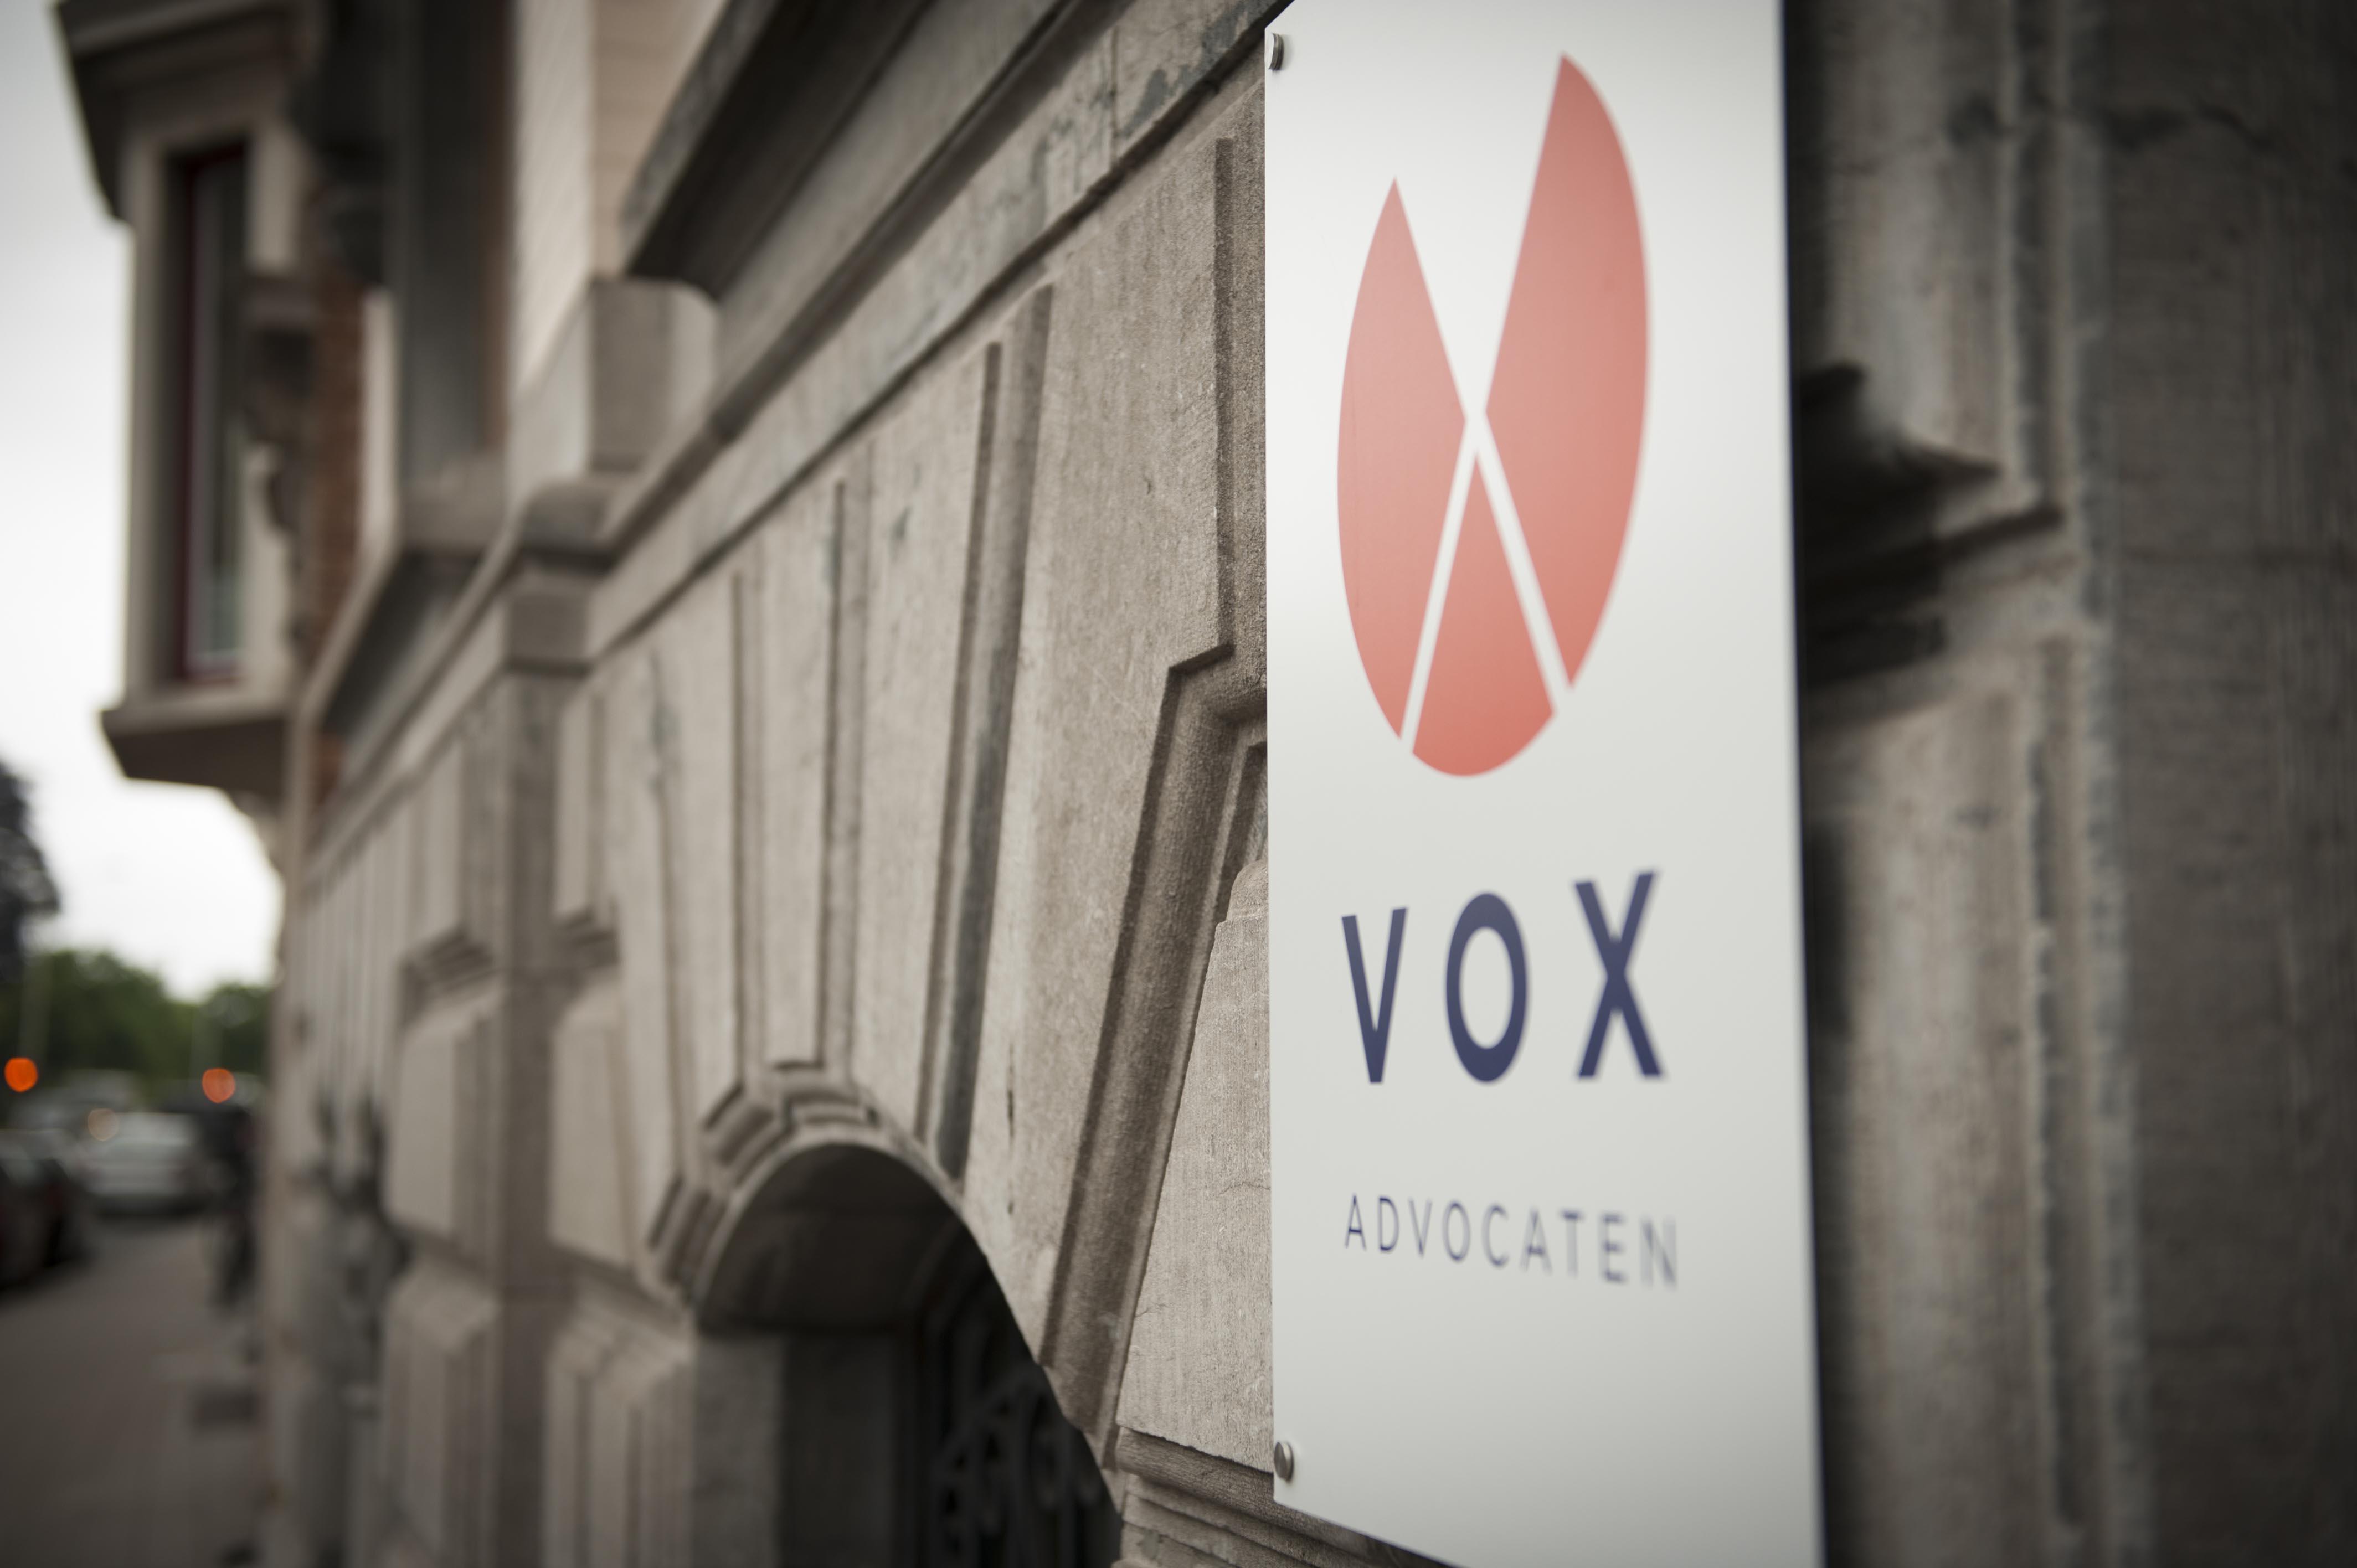 vox advocaten_03.naambord.b